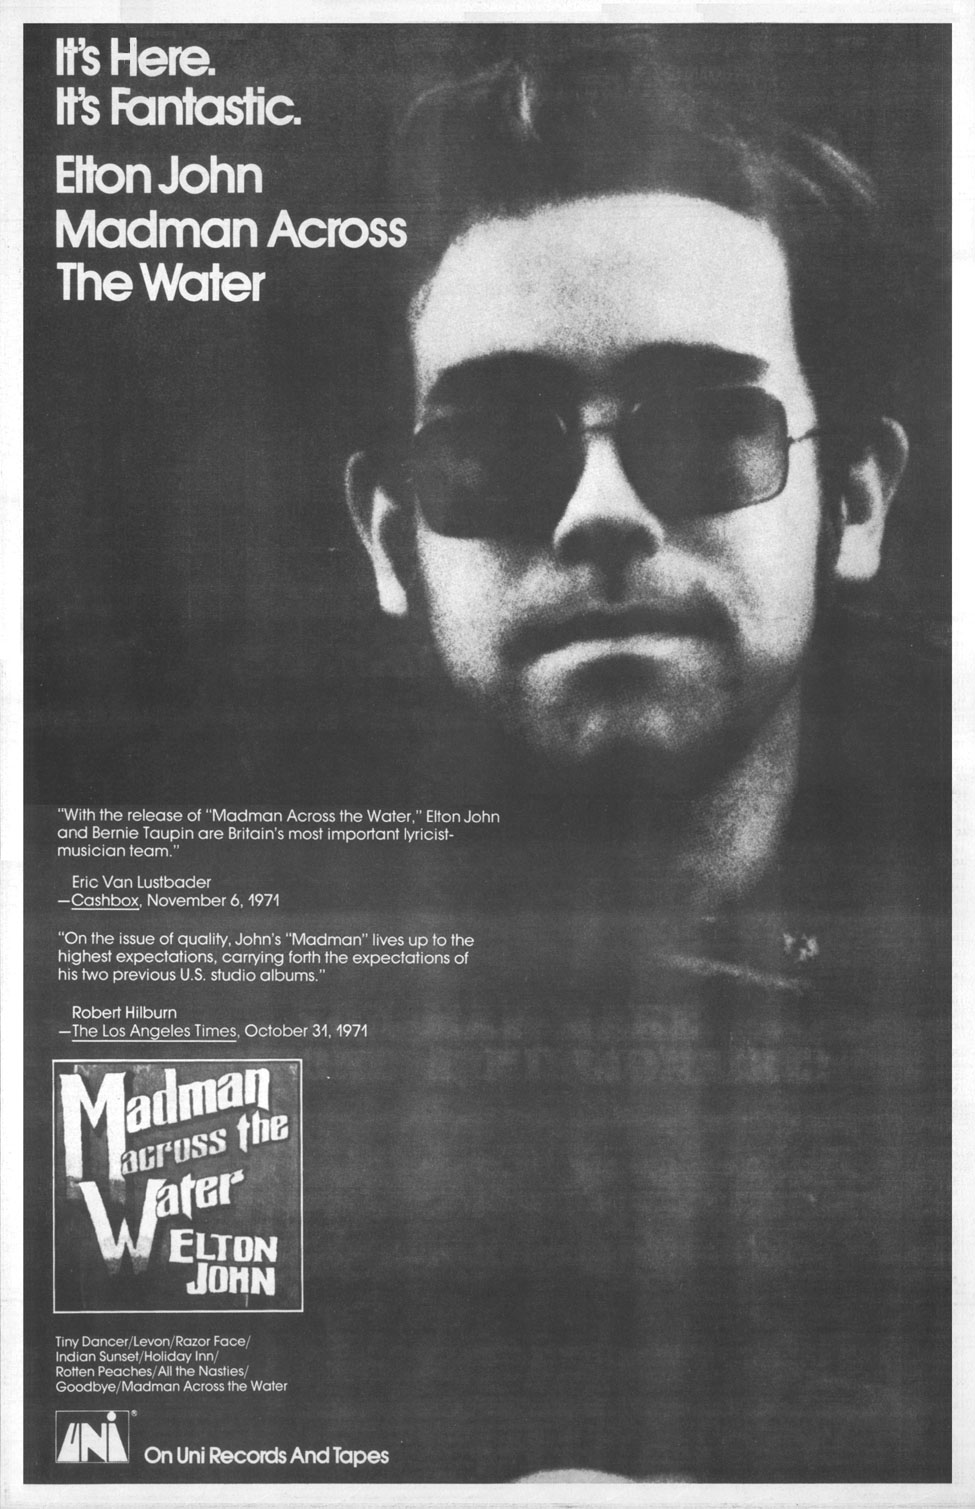 Elton John Madman Across The Water